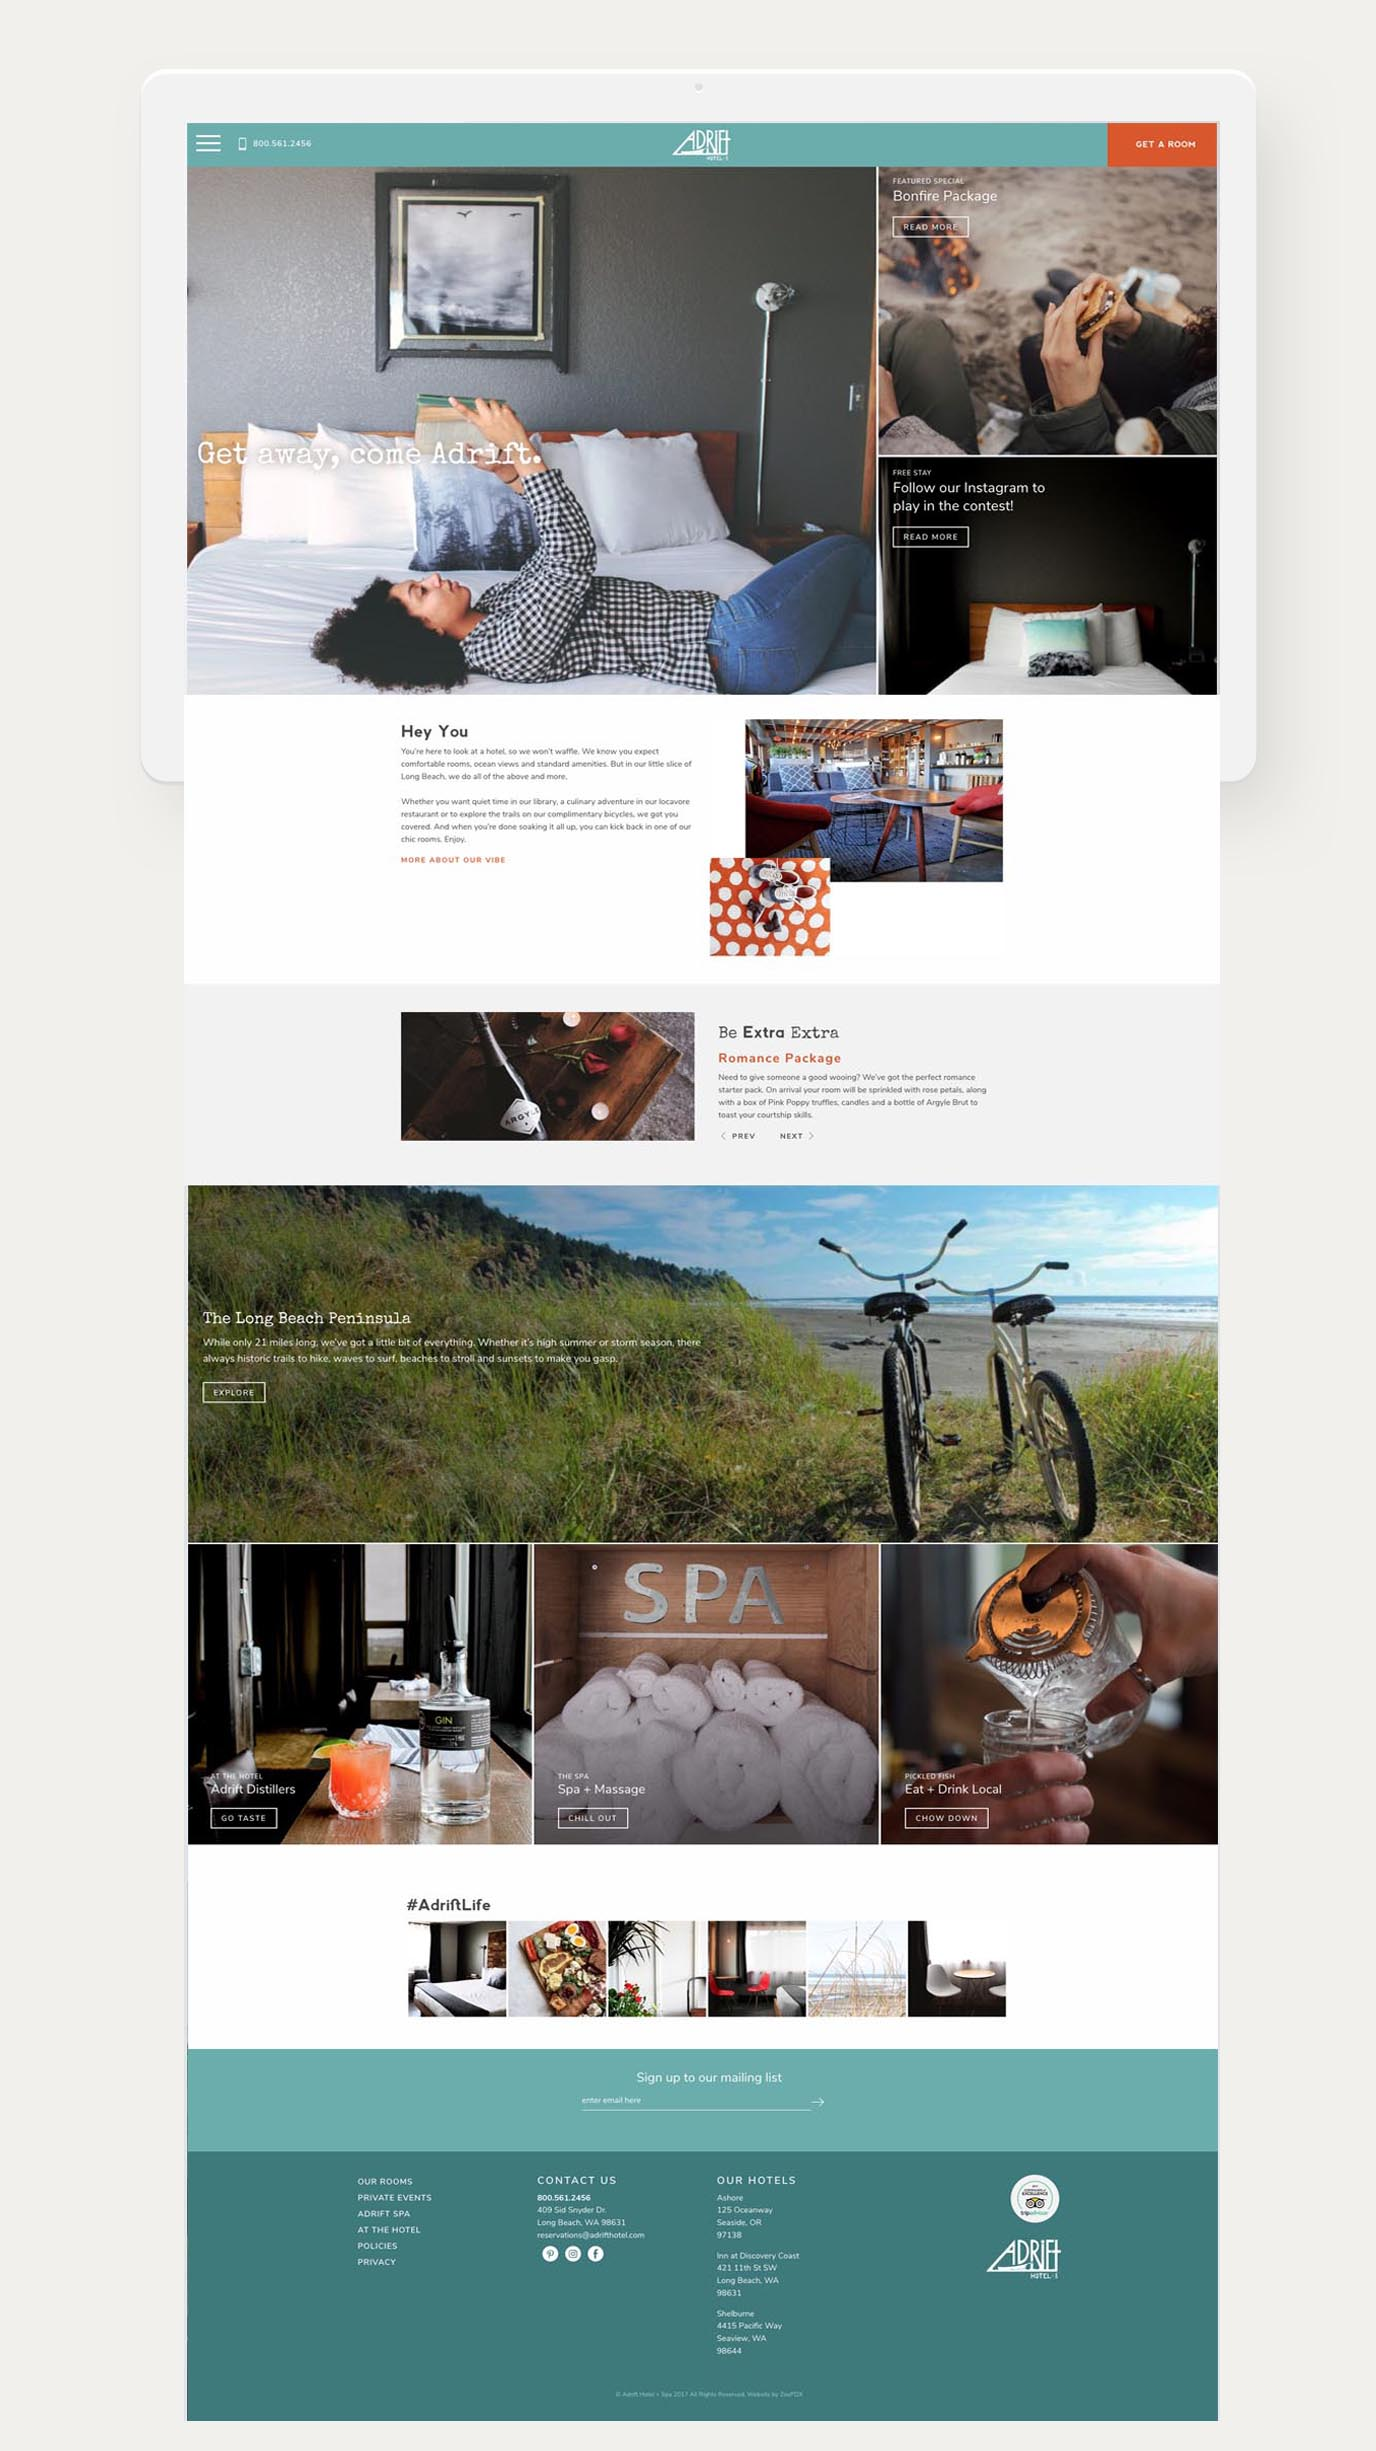 Adrift landing page web design